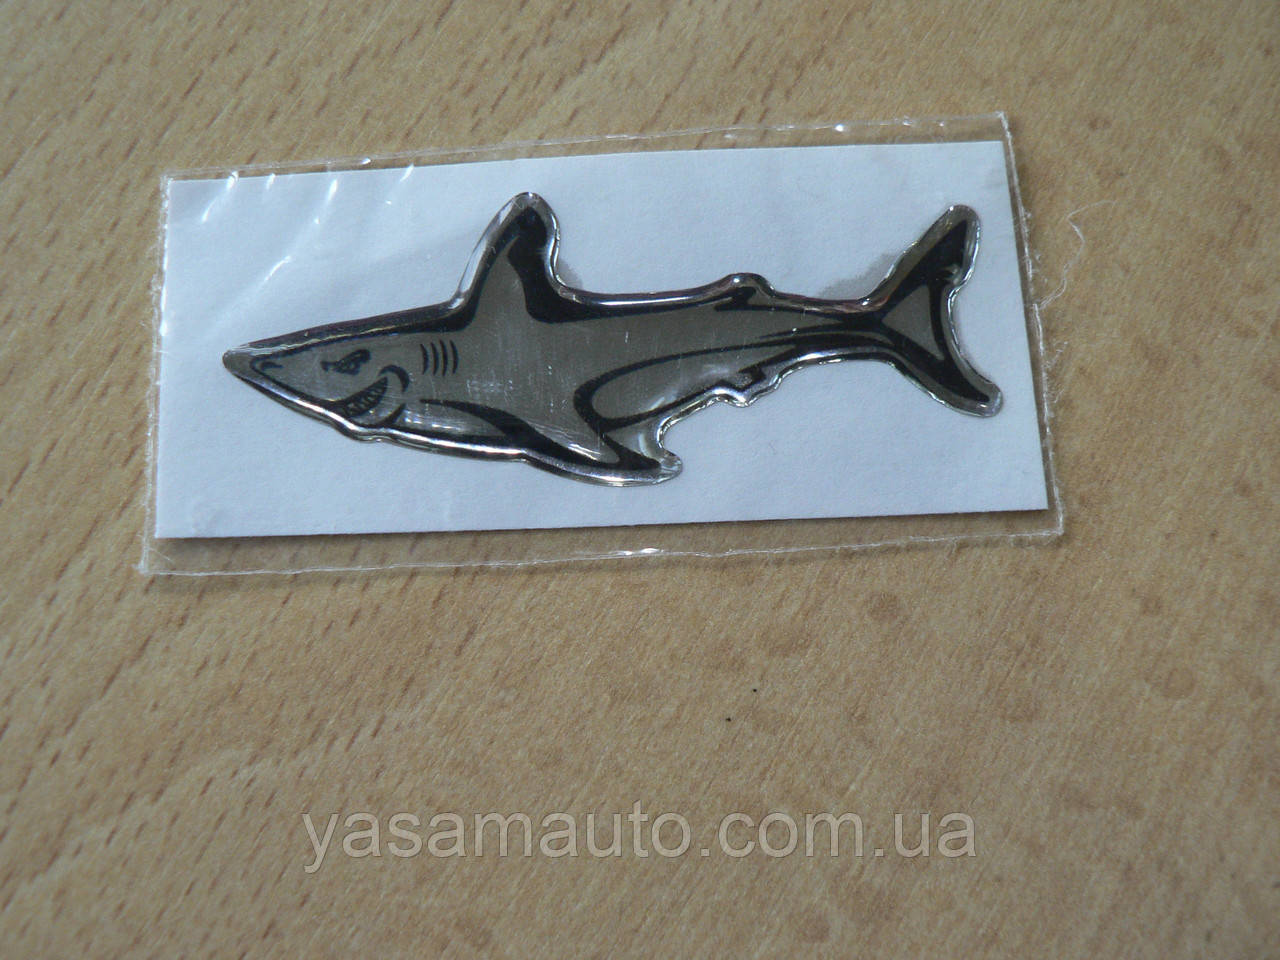 Наклейка s силиконовая Акула зубатая 63х25х1,1мм хром №1 нос влево в на авто